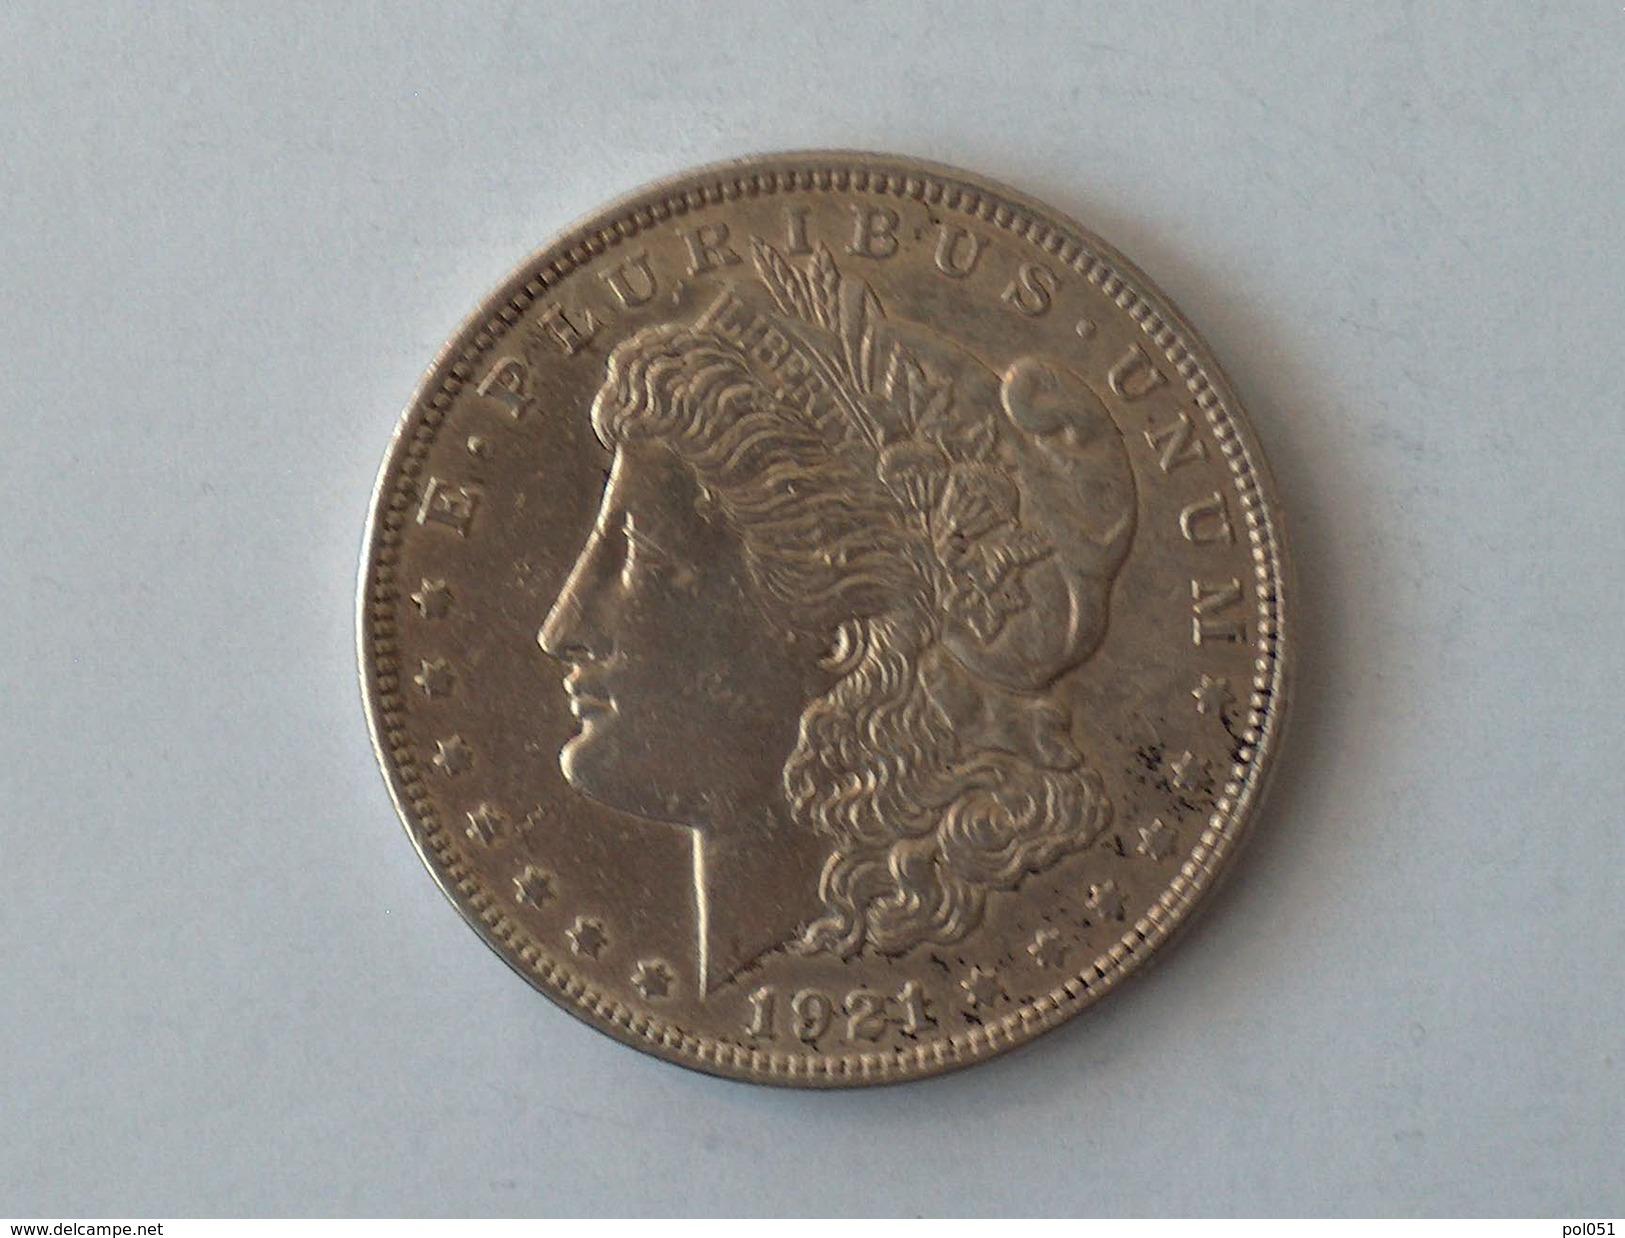 Etats-Unis, United States, USA - One 1 Dollar 1921 P Morgan - Silver, Argent - 1878-1921: Morgan